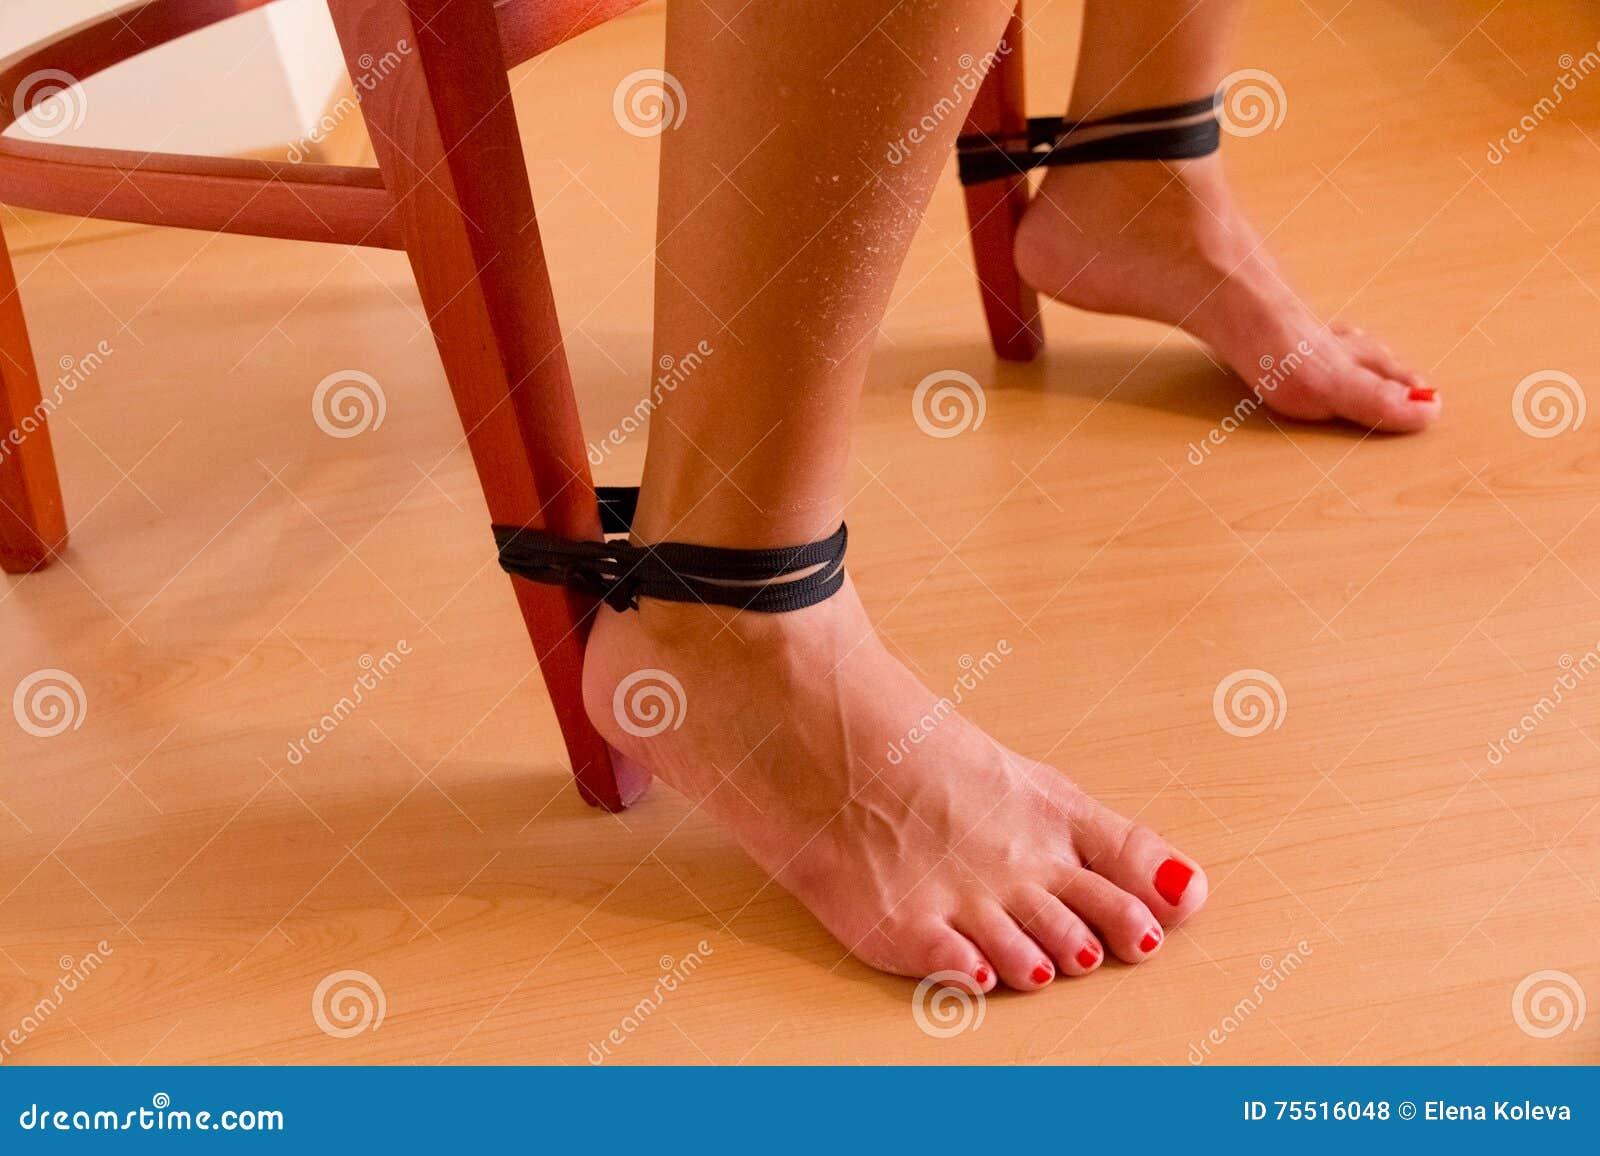 Feet tied